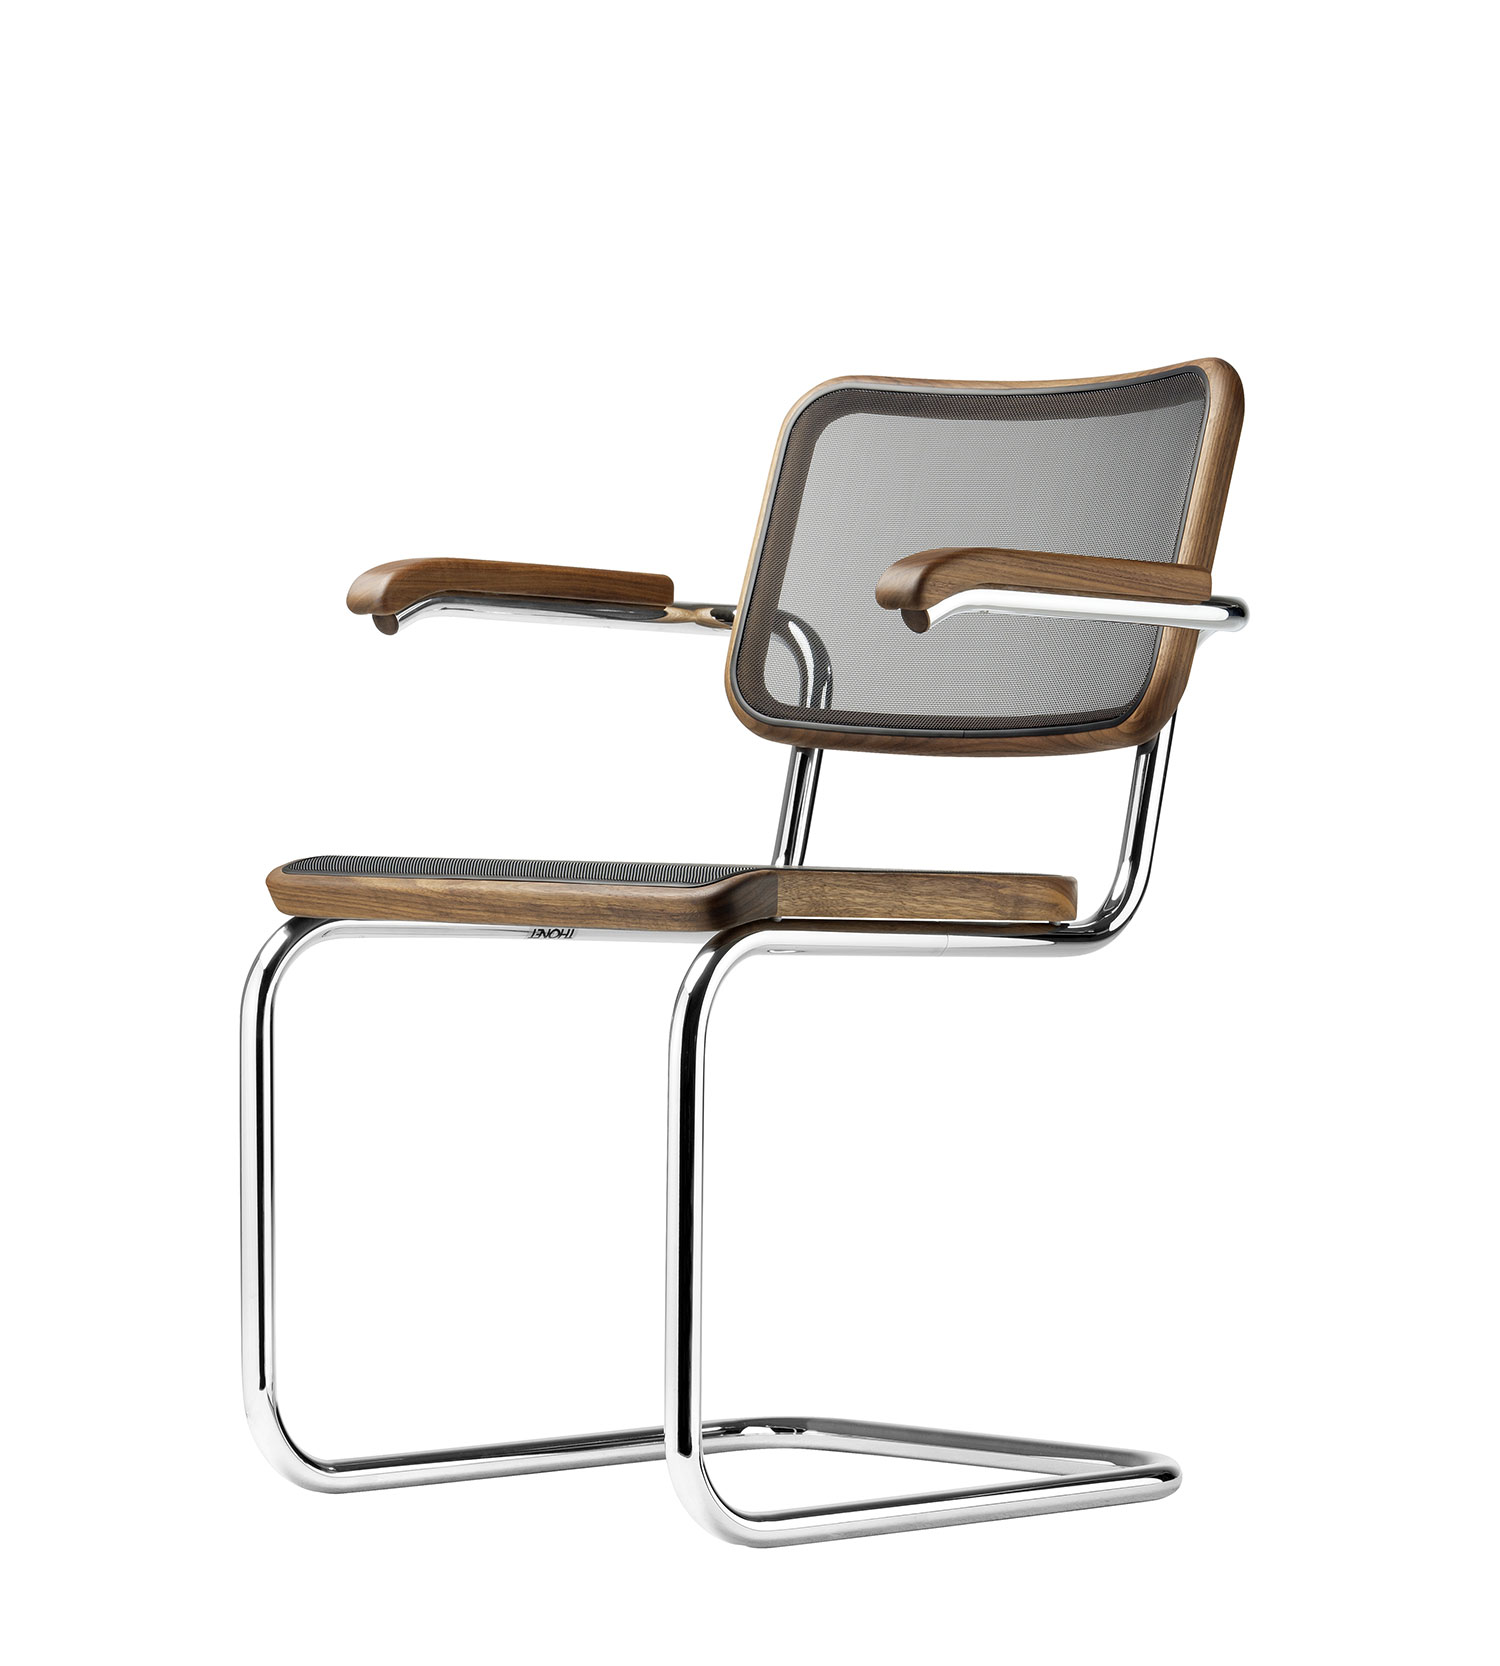 thonet stuhl freischwinger s 64 n pro office. Black Bedroom Furniture Sets. Home Design Ideas